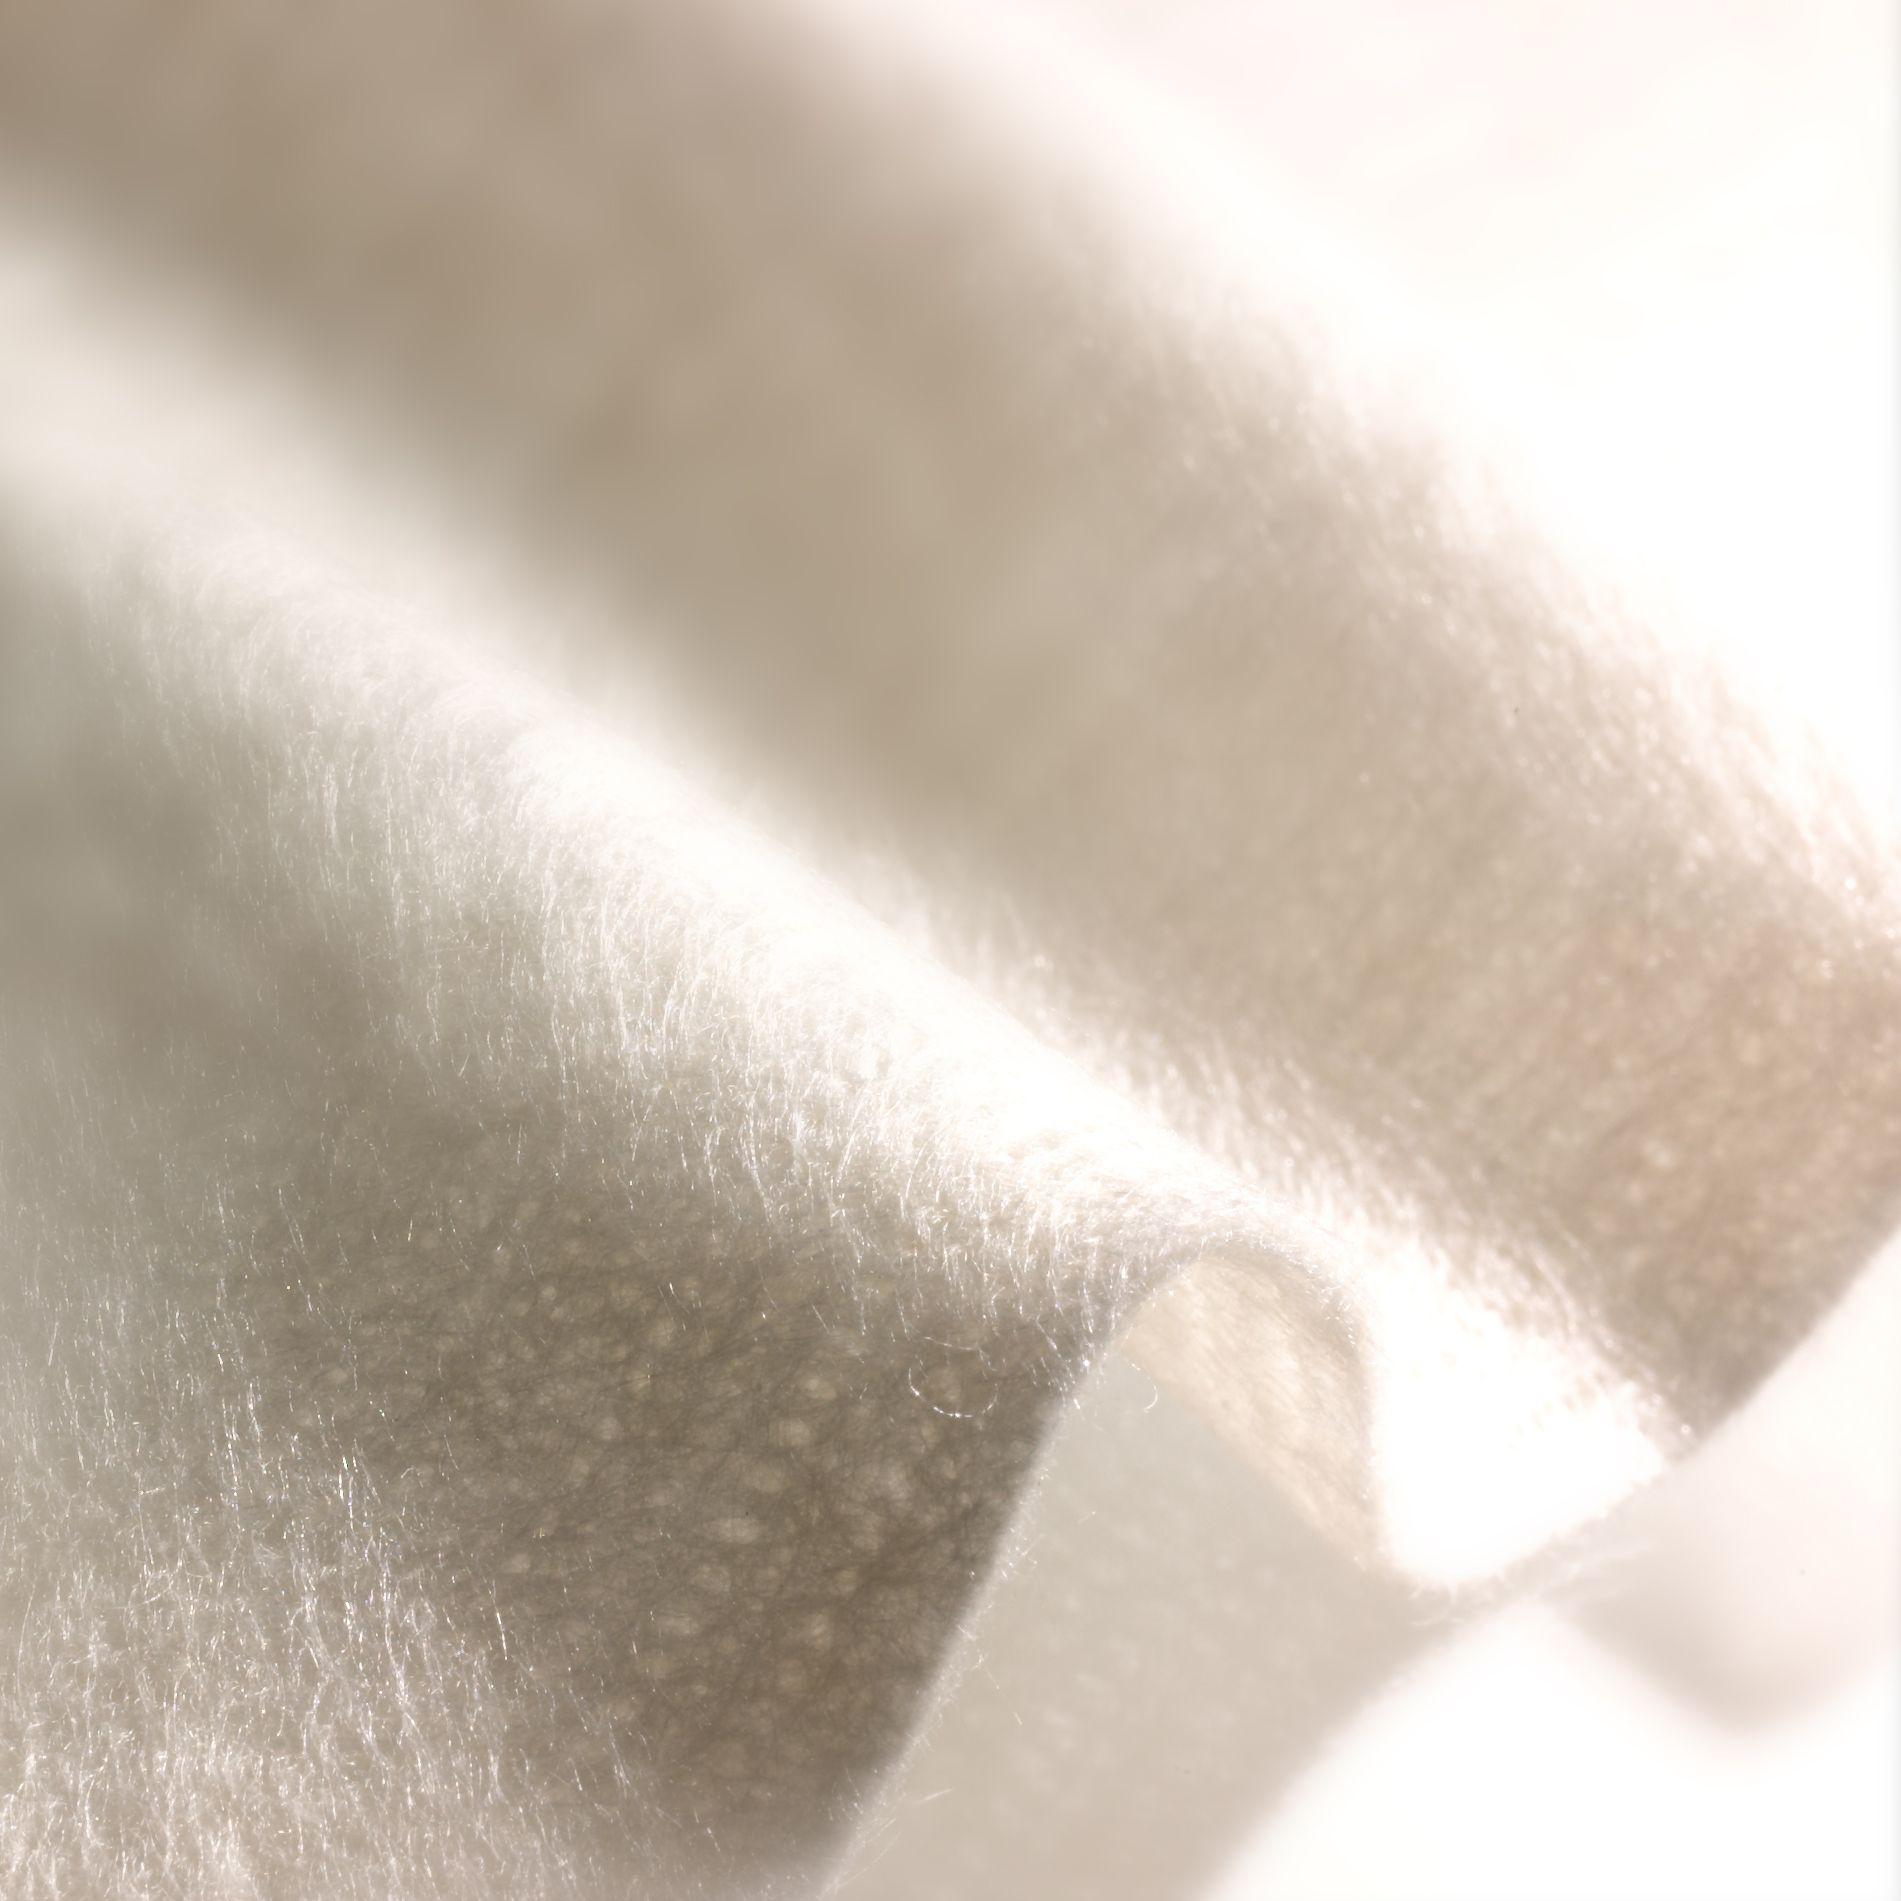 Apósito de alginato de calcio con plata nanocristalina